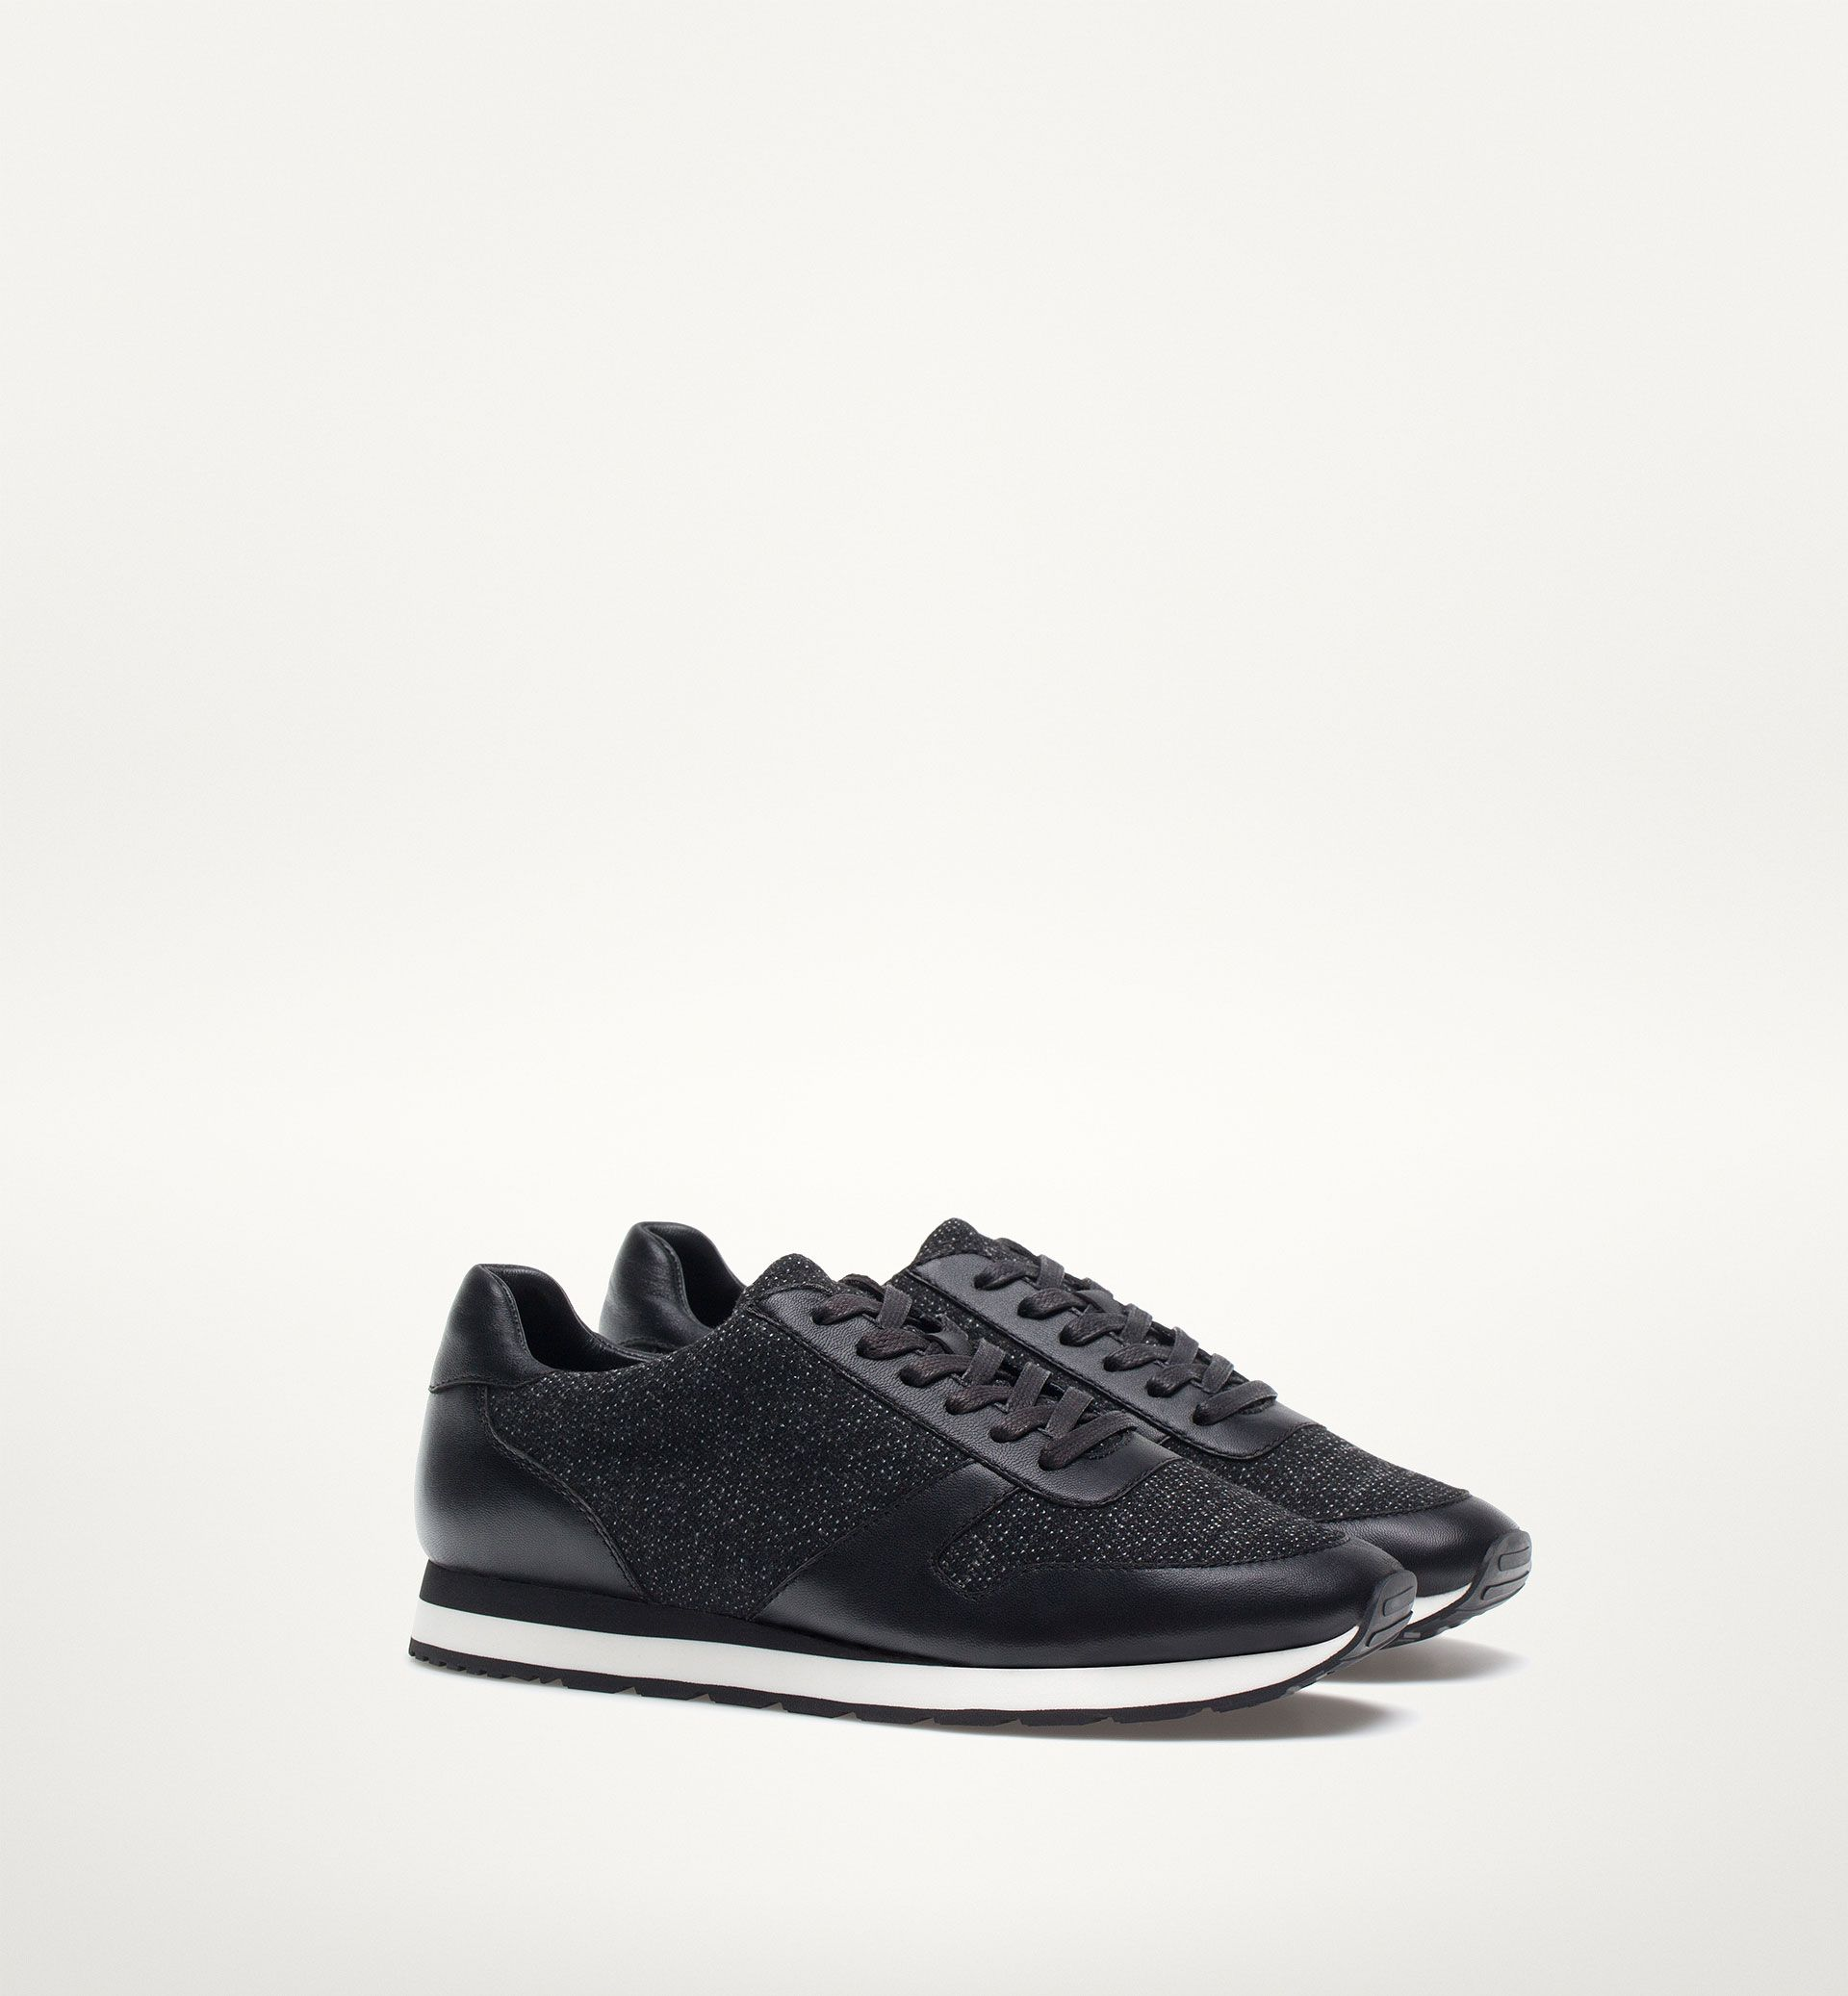 0e1faf9c87 SNEAKER NEGRA - massimo dutti | Sneakers | Black sneakers, Shoes ...